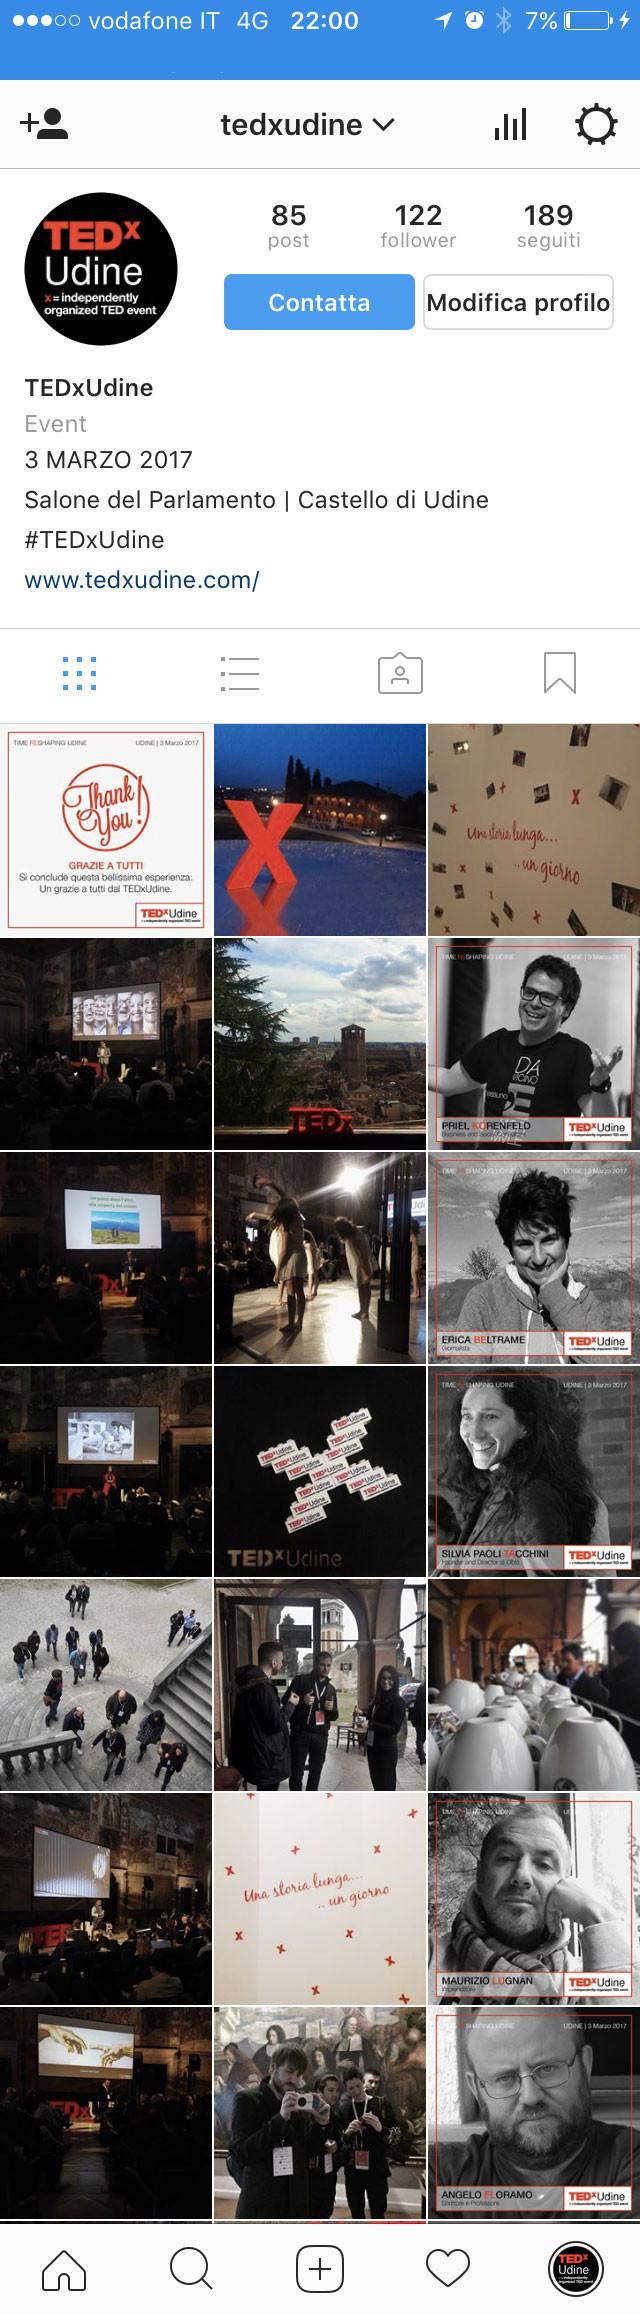 instagram TEDxUdine